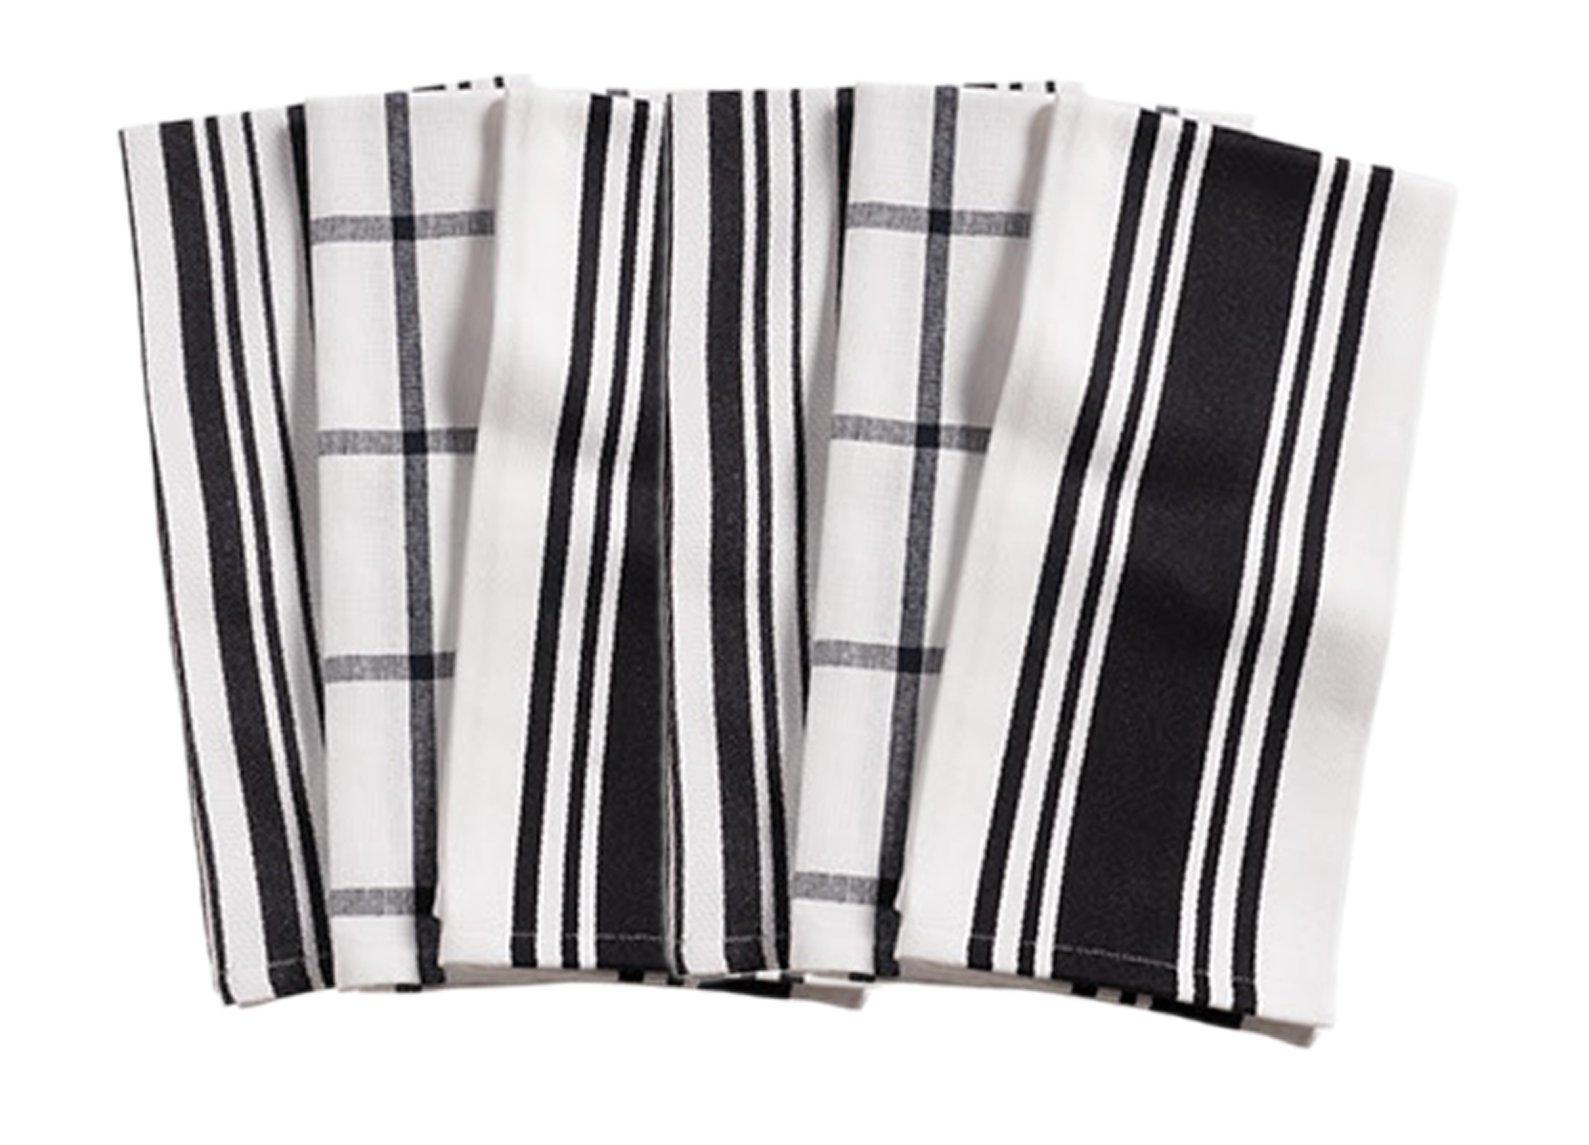 KAF Home Kitchen Towels,  Set of 6, Black & White, 100% Cotton, Machine Washable, Ultra Absorbent